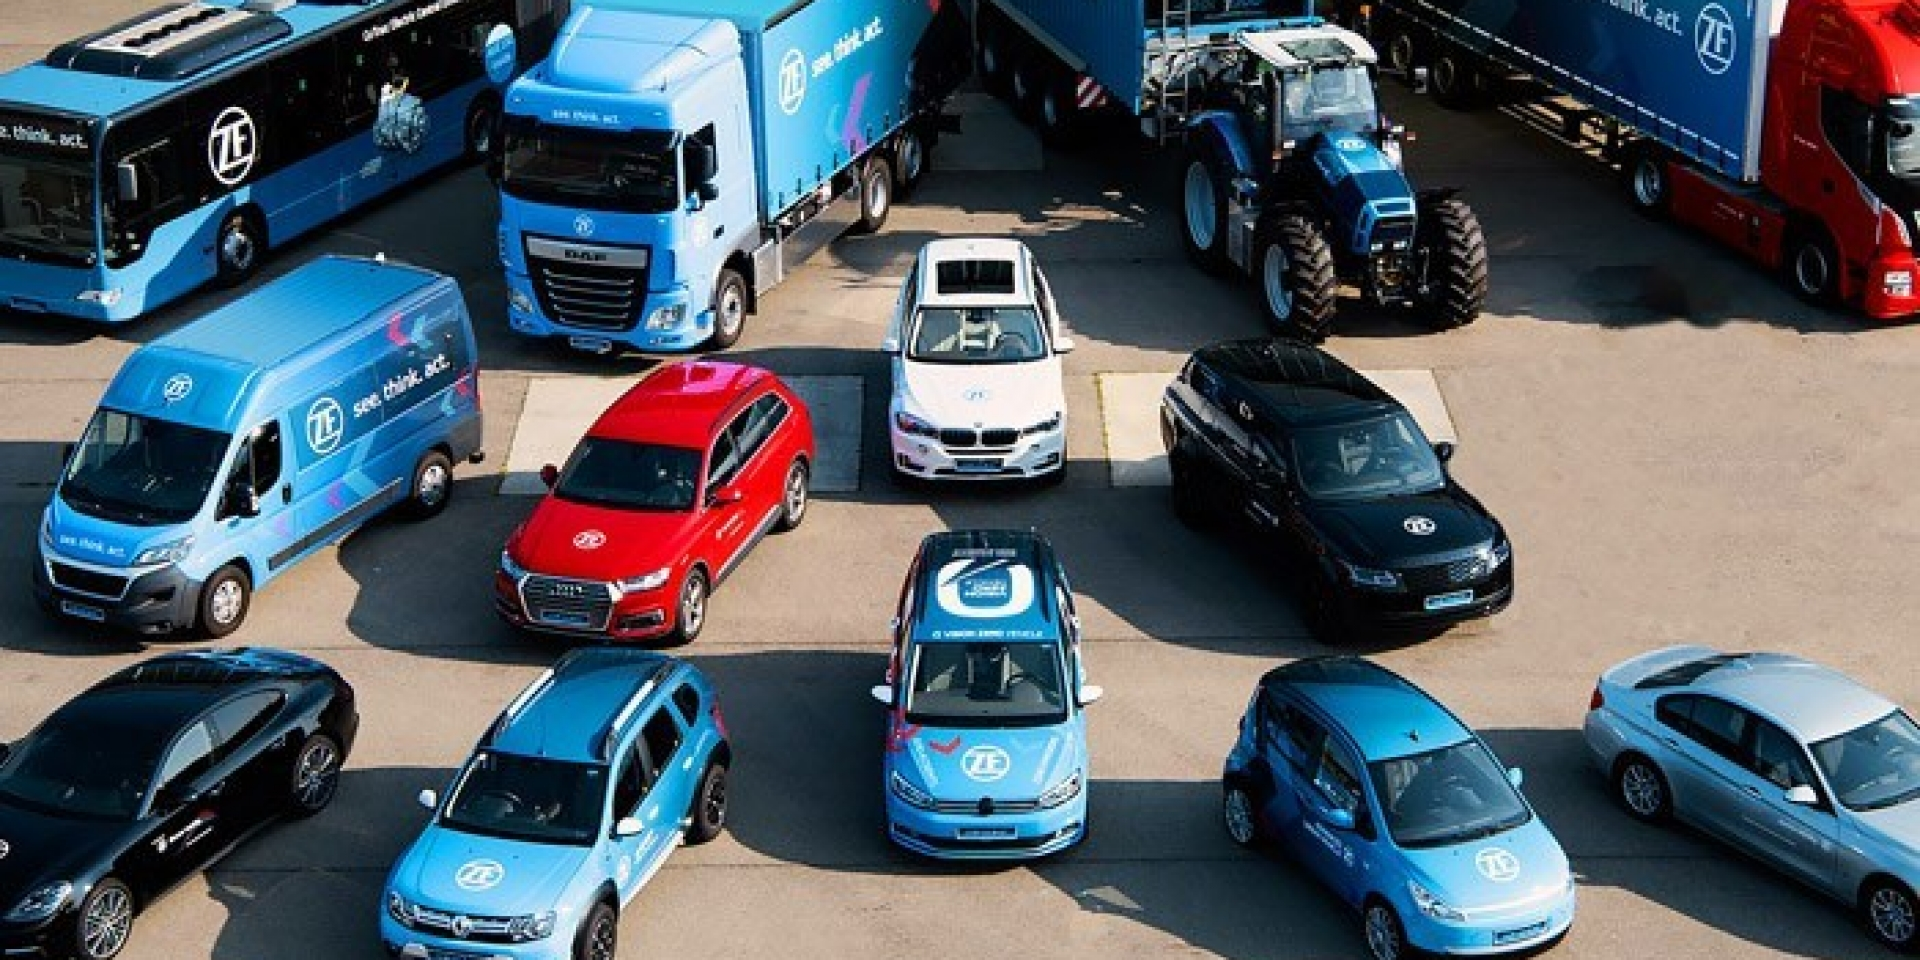 ZF開發電動車變速箱!傳統燃油車輛將不再研發!